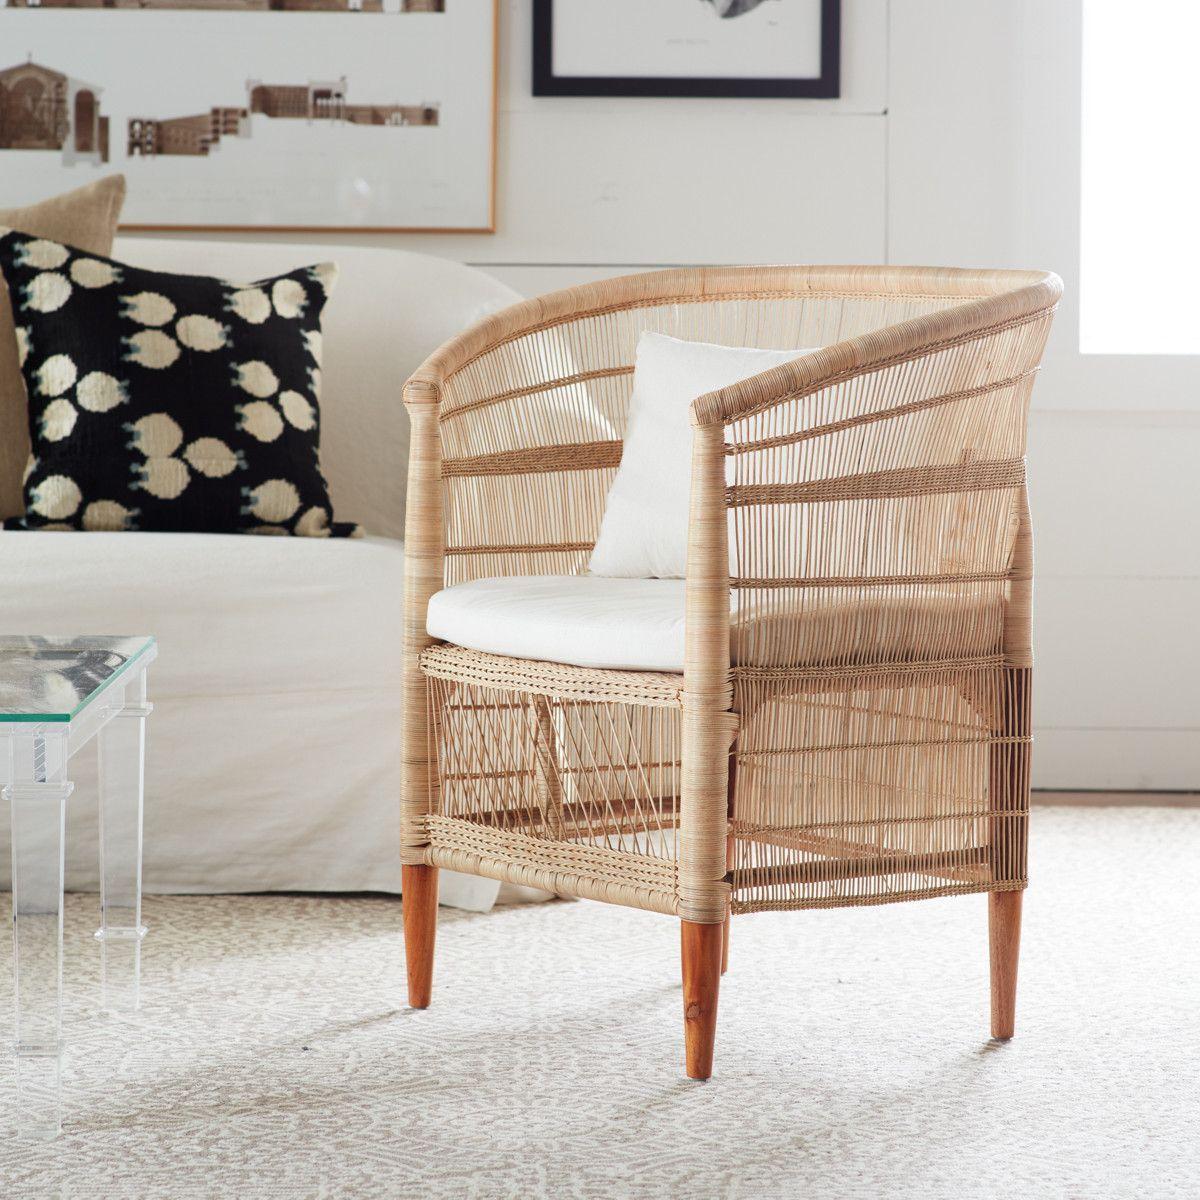 Malawi Armchair In 2019 March Design Furniture Rustic Fauteuil Rotin Fauteuil Rotin